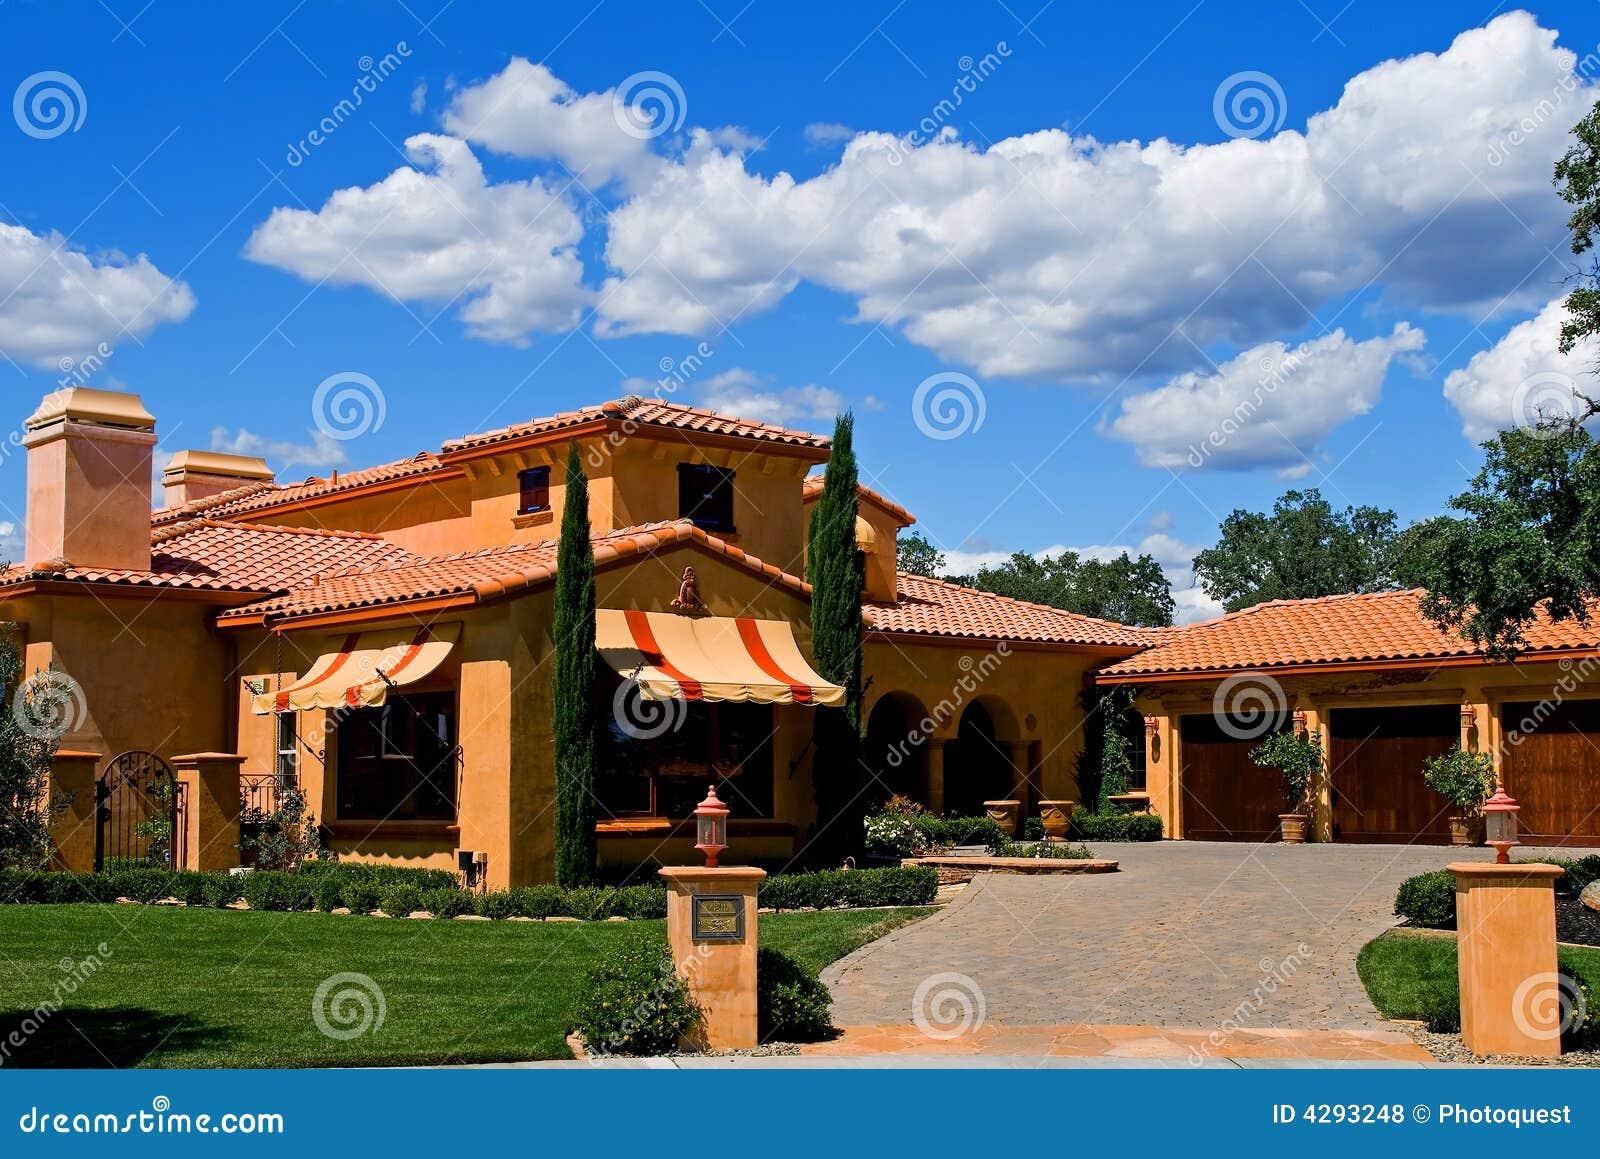 Casa italiana do estilo fotos de stock royalty free for Casa italiana